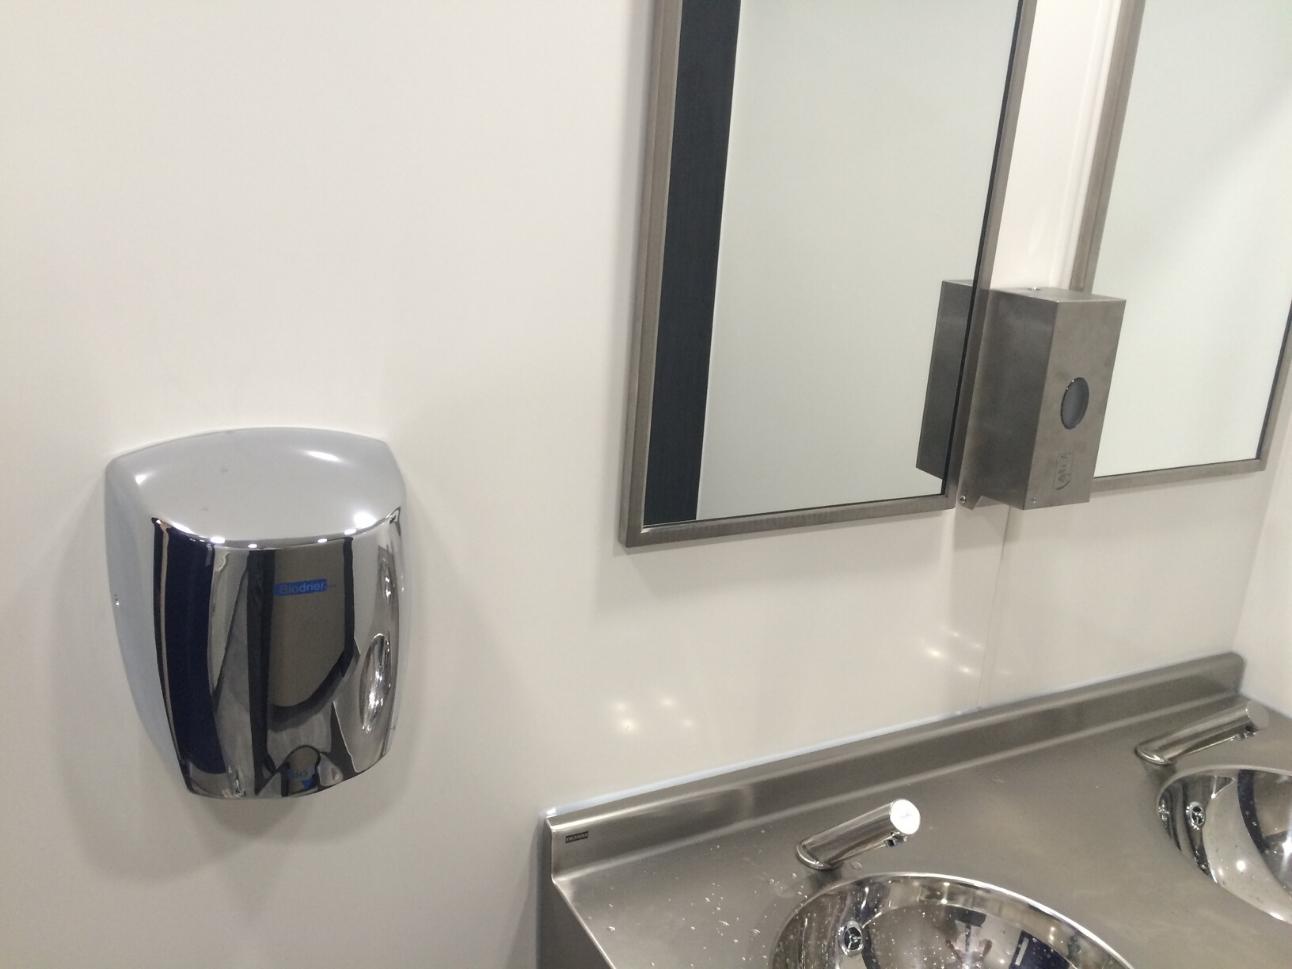 Metroline Washroom Case Study   Commercial Washrooms